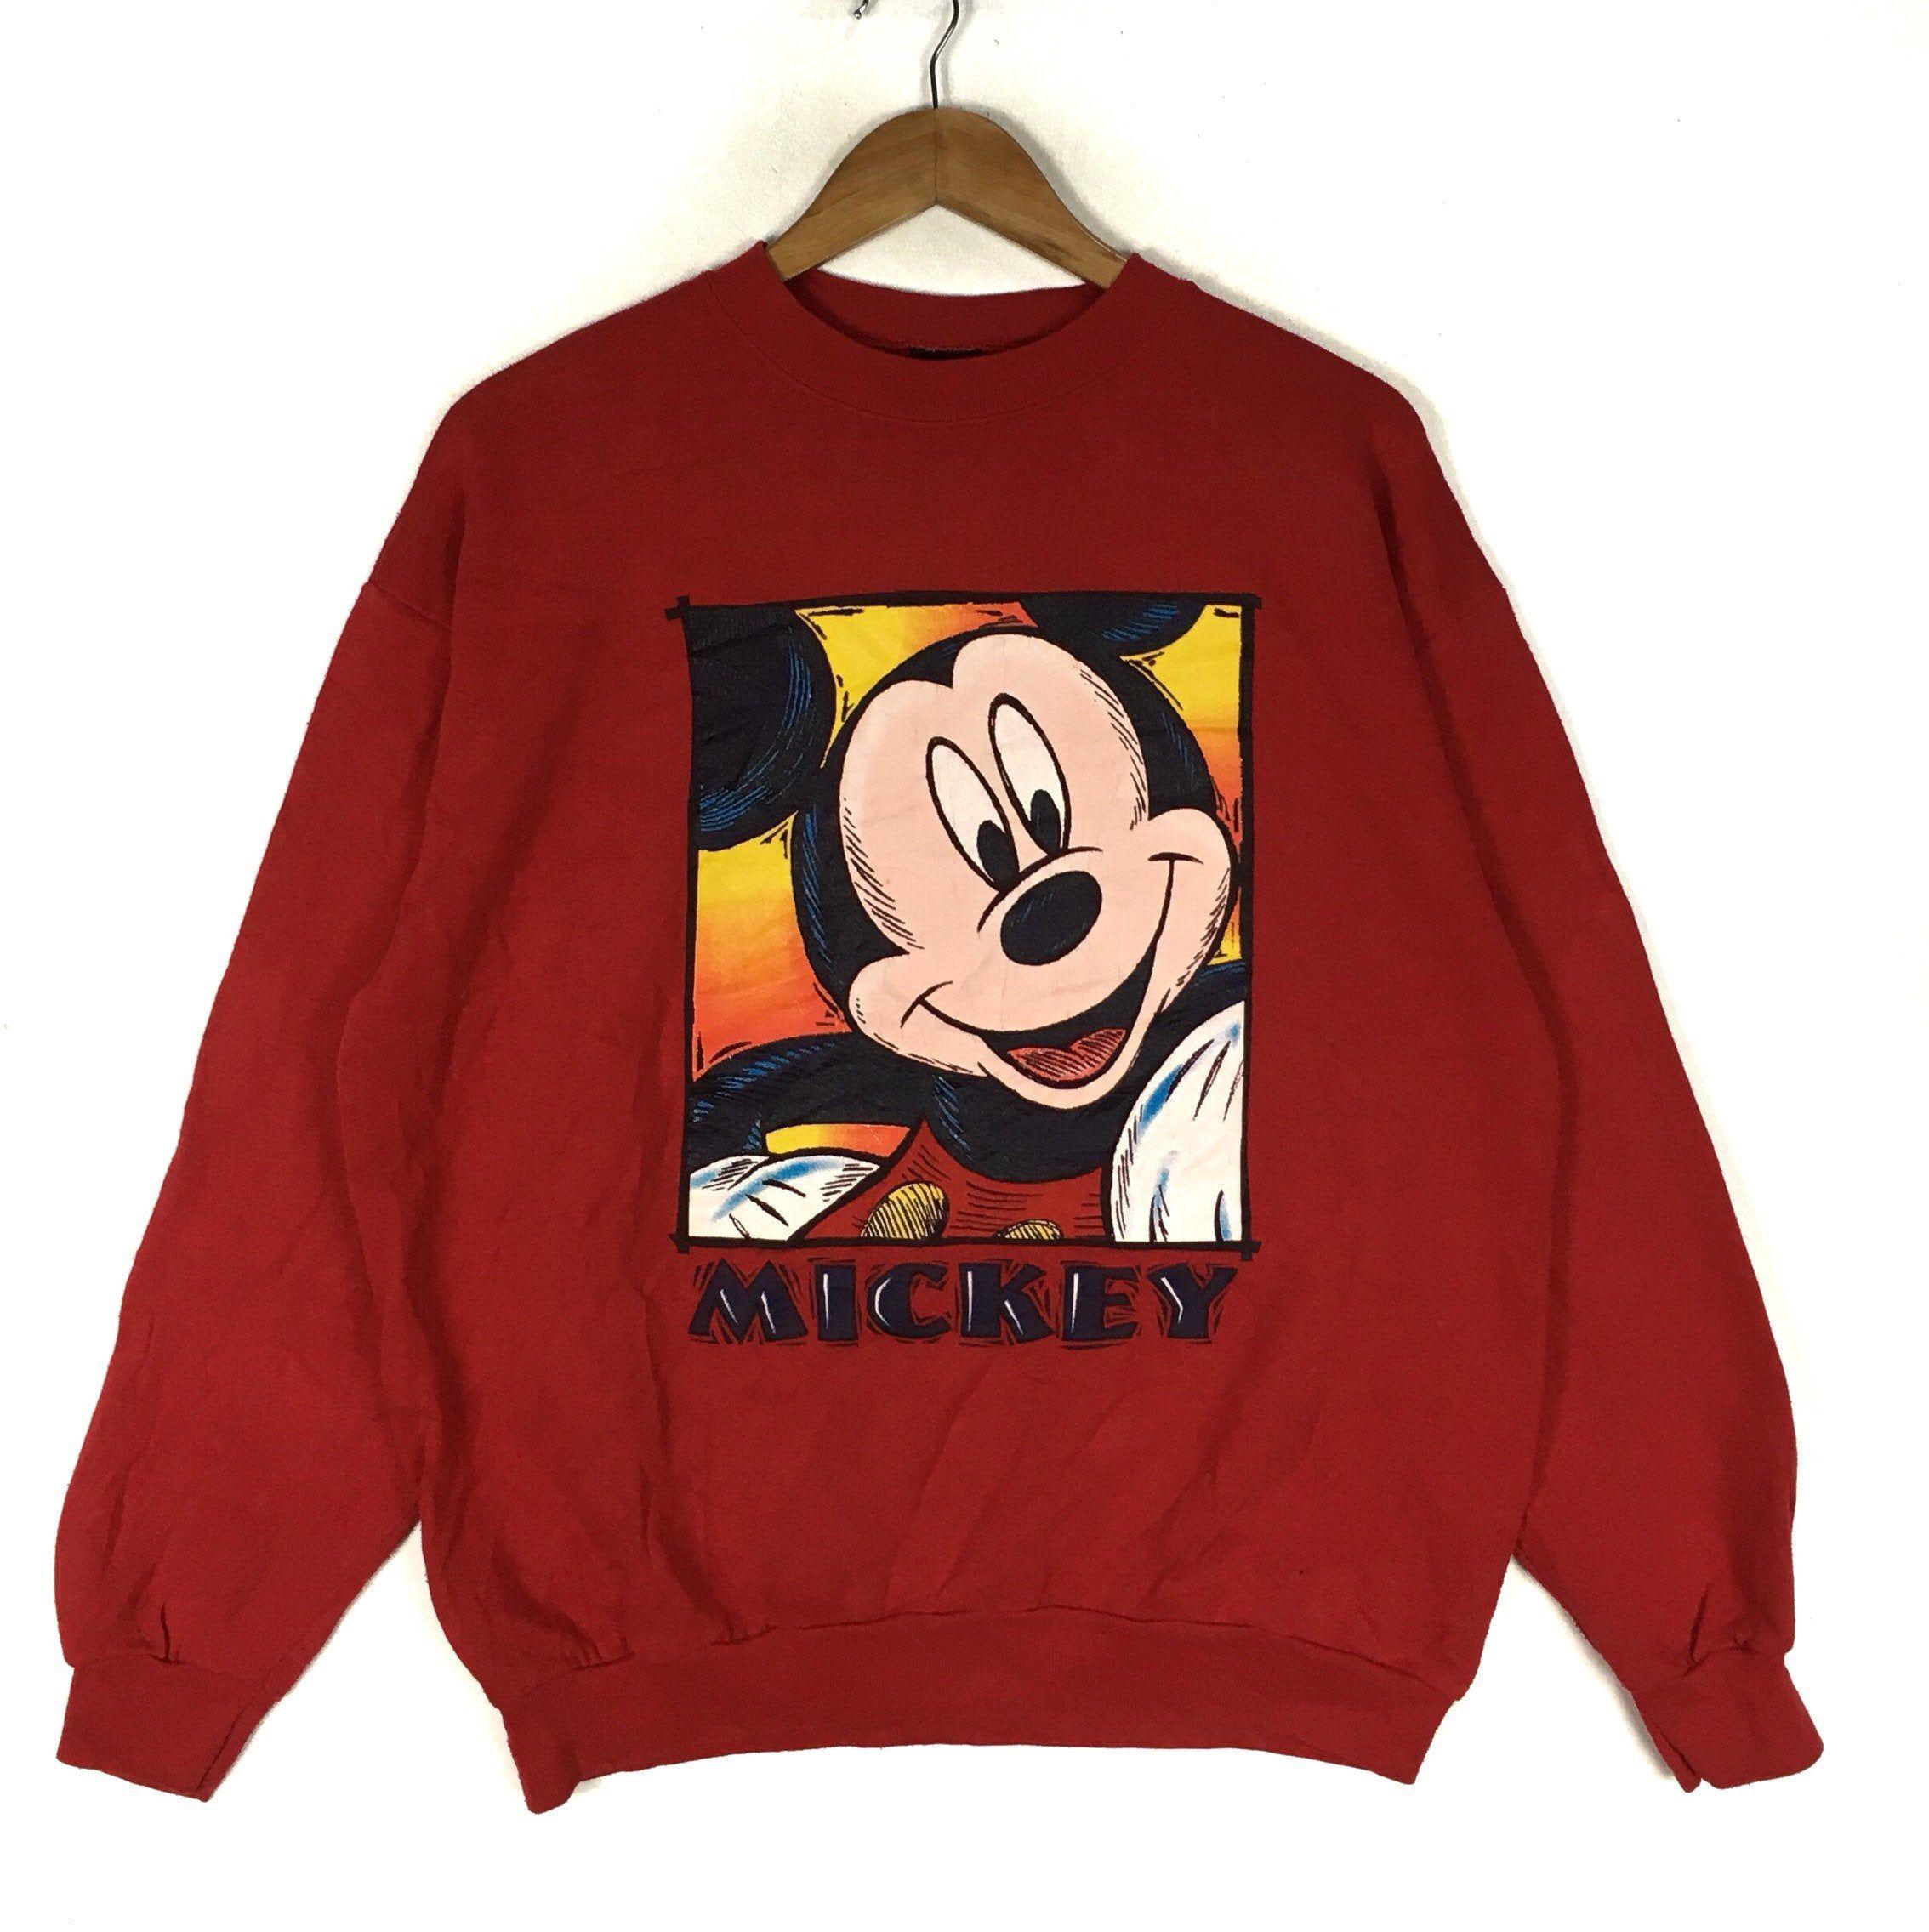 Vintage Mickey Mouse Crewneck Big Logo Sweatshirt Jumper Red Etsy Sweatshirts Vintage Mickey Mouse Vintage Mickey [ 2272 x 2268 Pixel ]